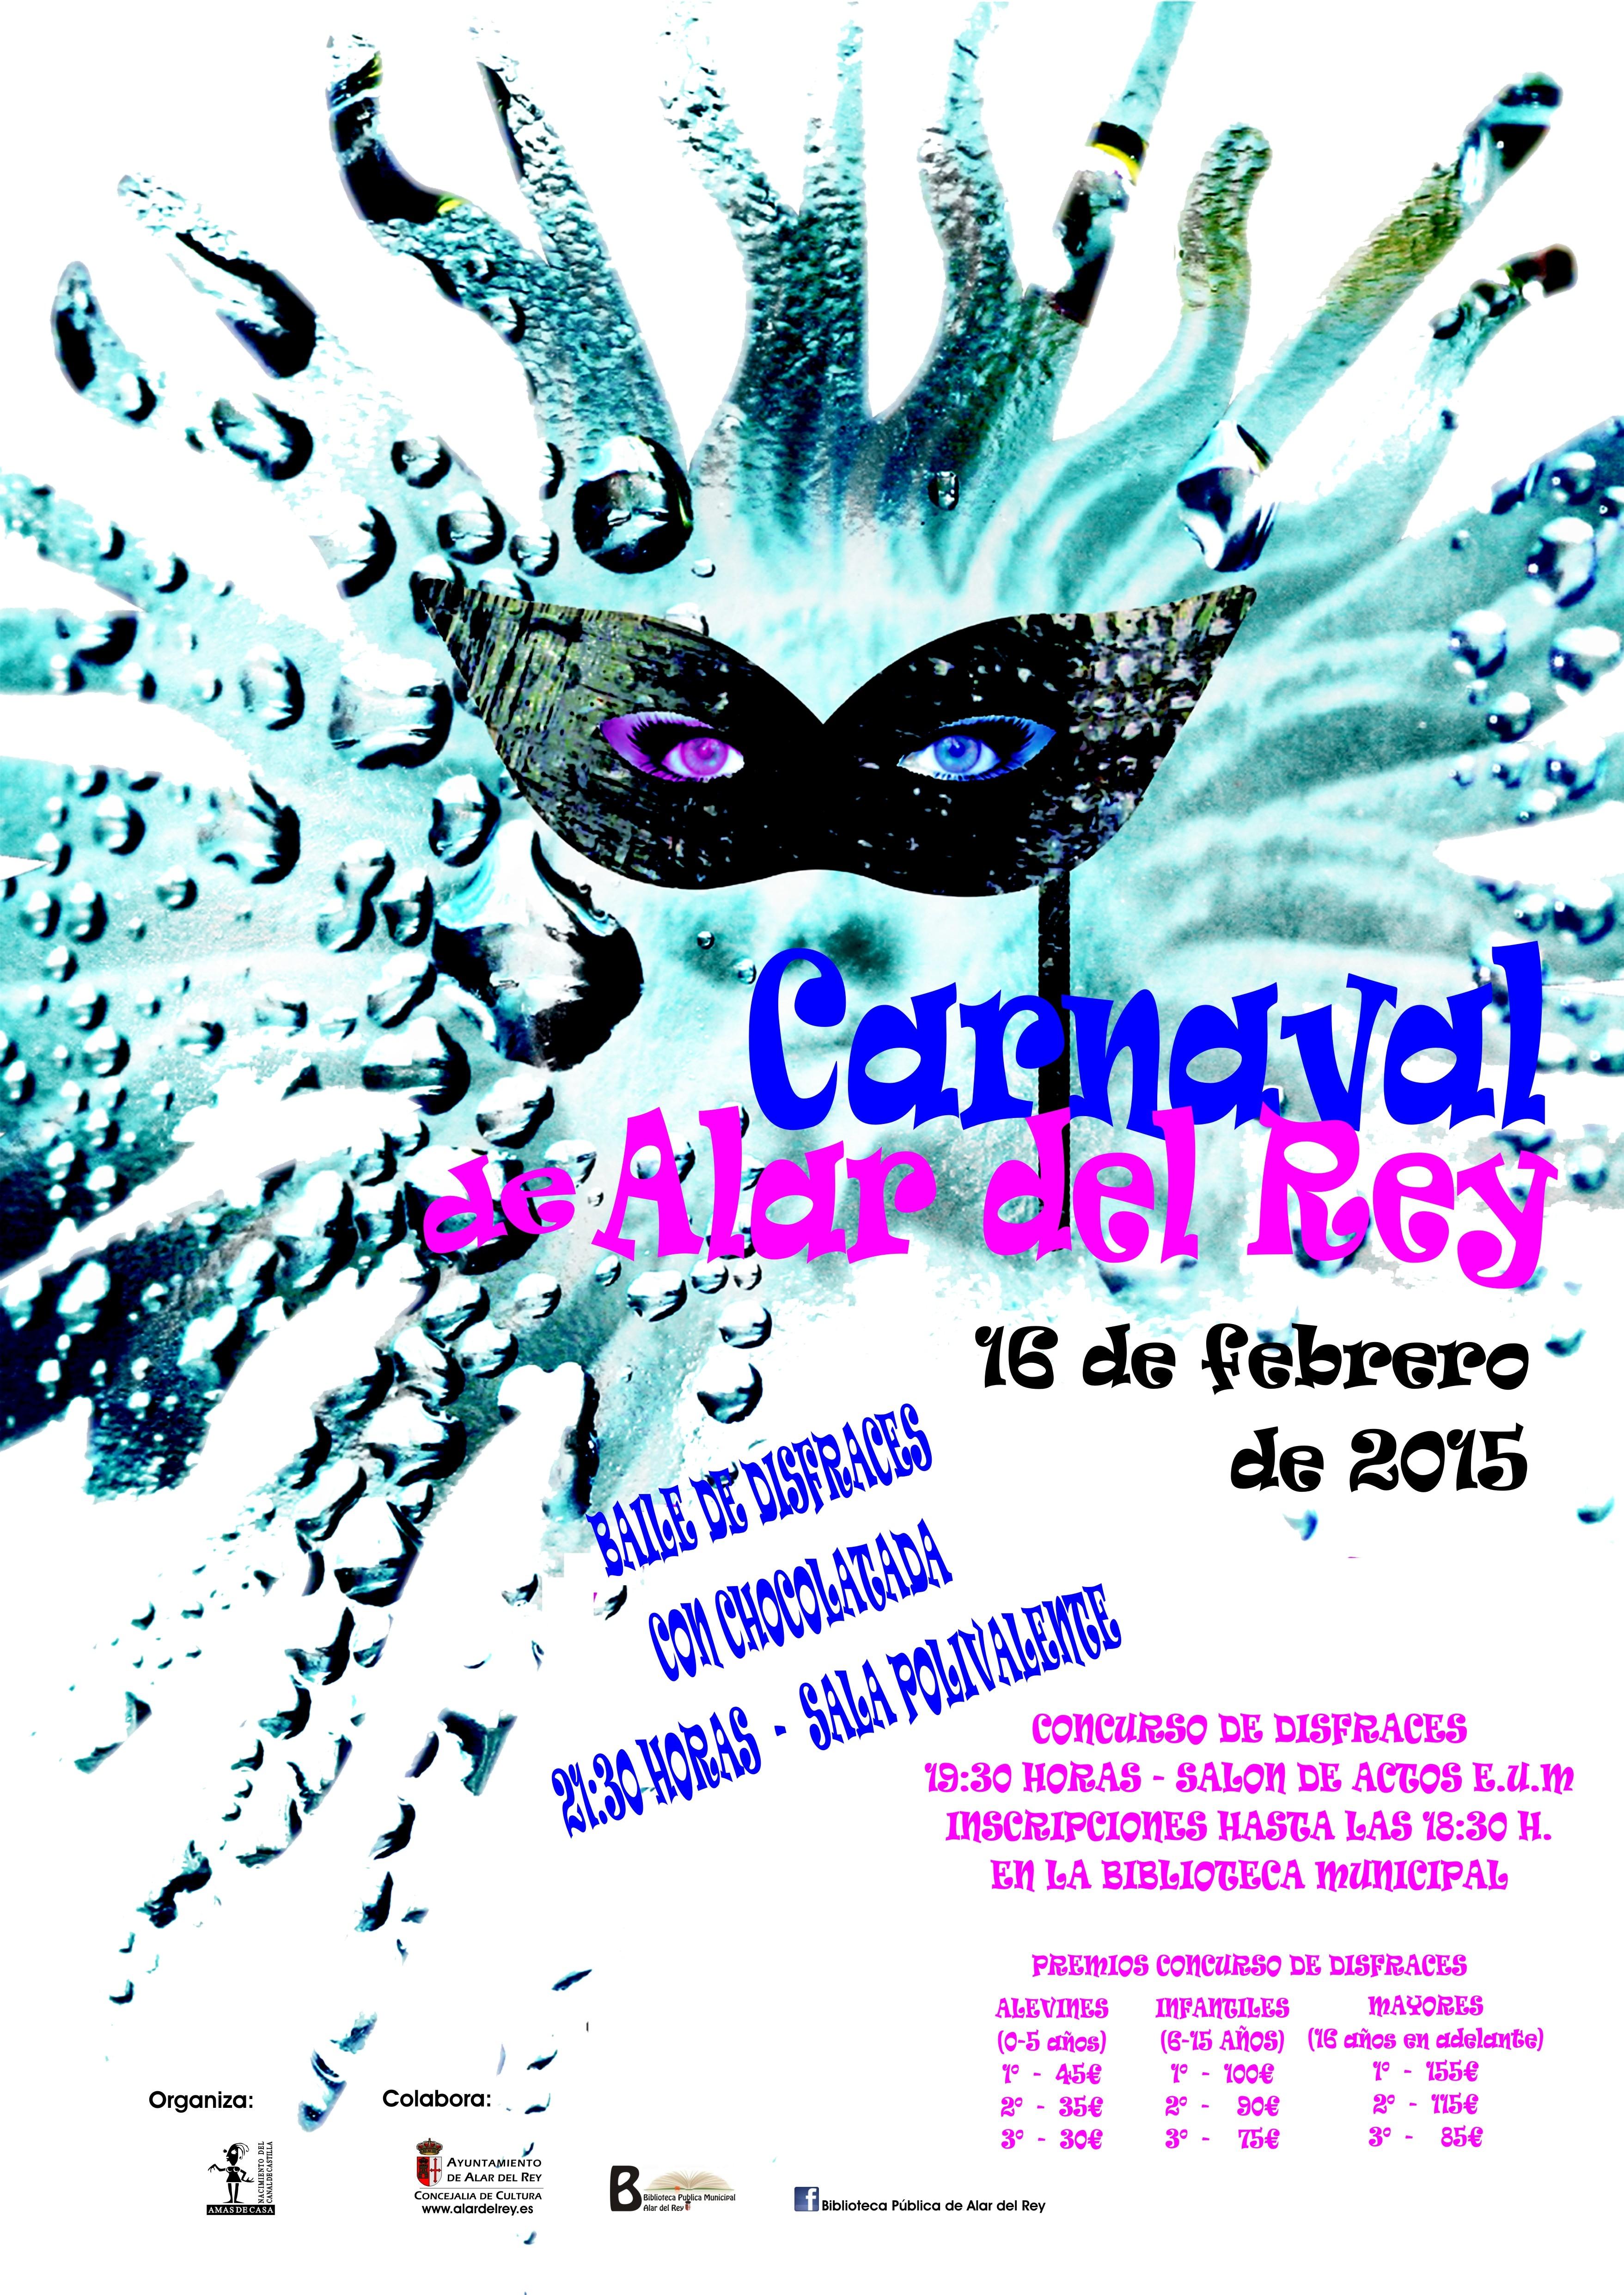 Carnavales en Alar